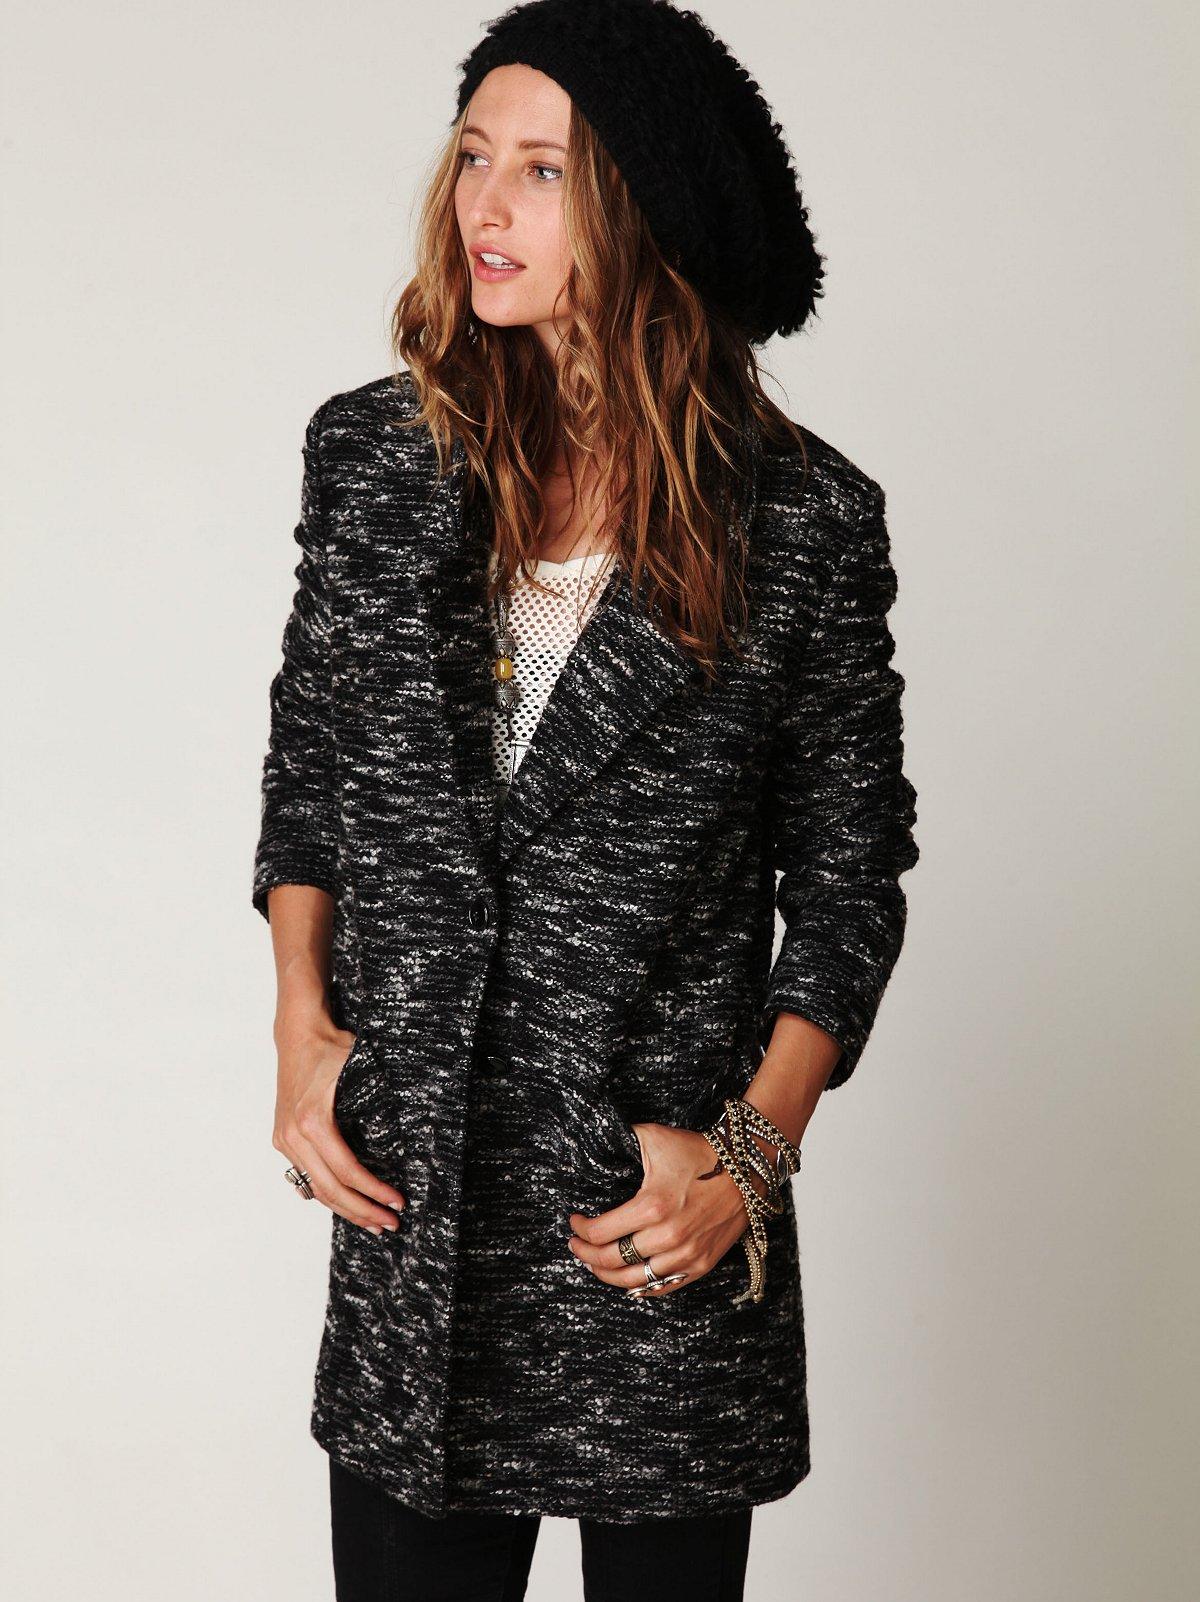 Boucle Textured Jacket